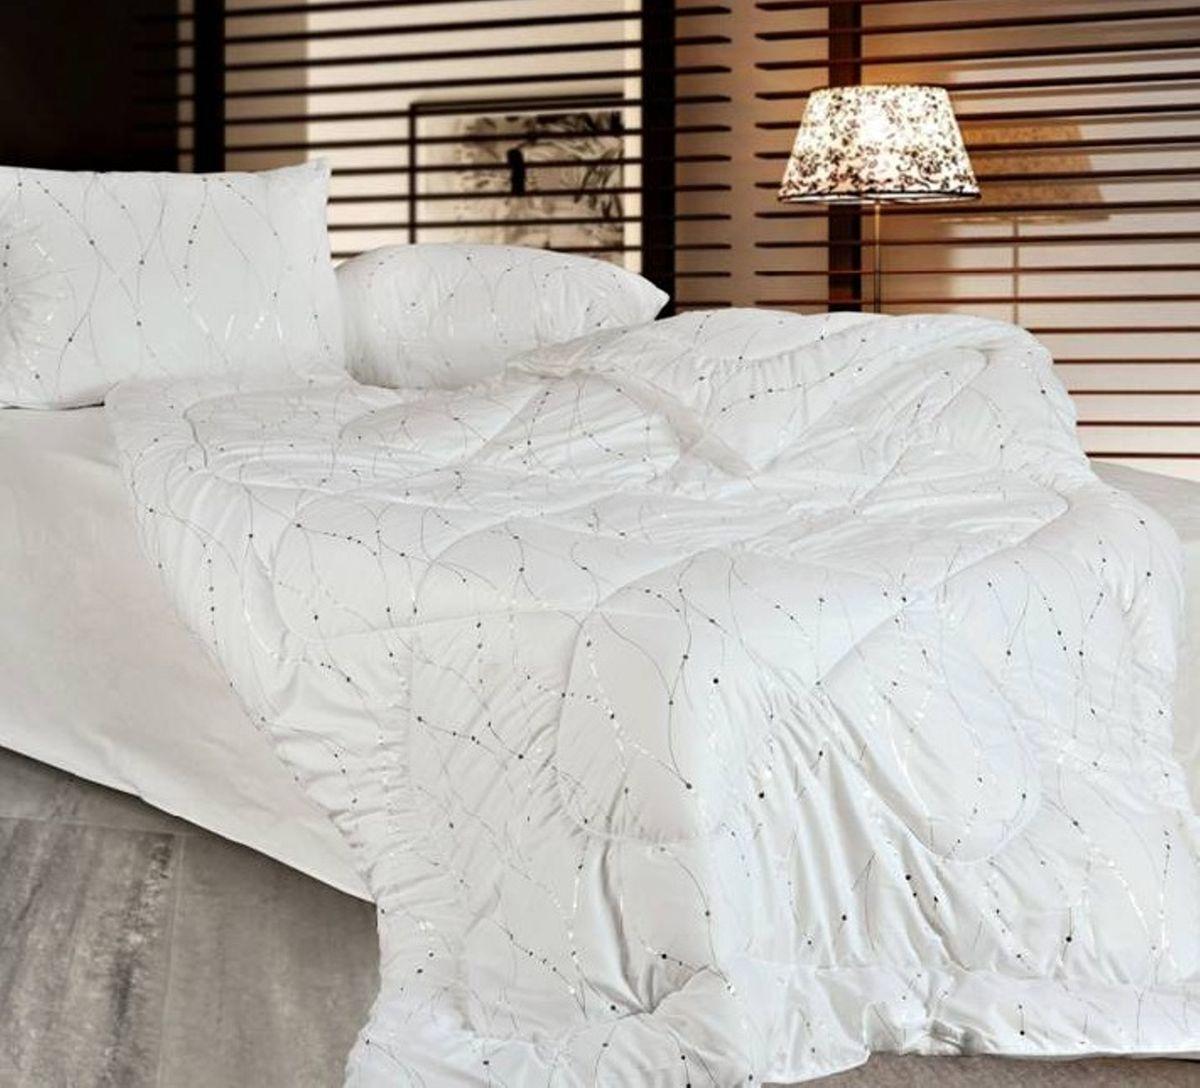 Одеяло Home & Style, 200 x 220 см, наполнитель: соевое волокно одеяло легкое william roberts sensual tencel наполнитель эвкалиптовое волокно 155 х 200 см